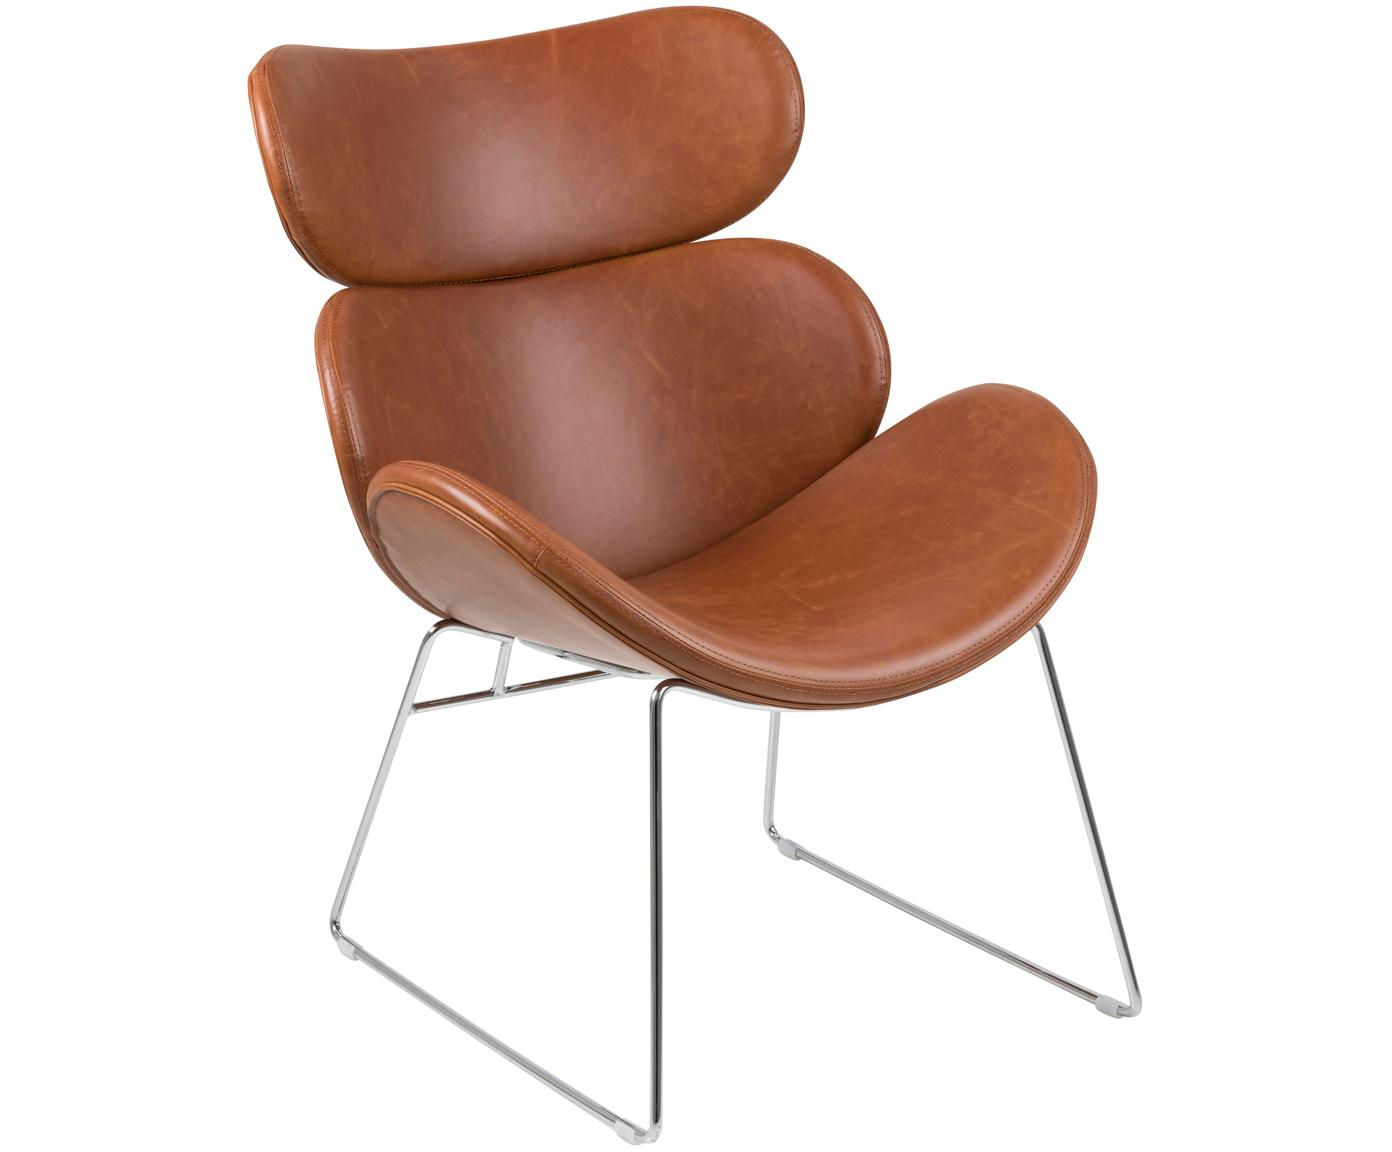 Moderne loungefauteuil Cazar van kunstleer, Bekleding: kunstleer (polyurethaan), Frame: verchroomd metaal, Cognackleurig, chroomkleurig, B 69 x D 79 cm